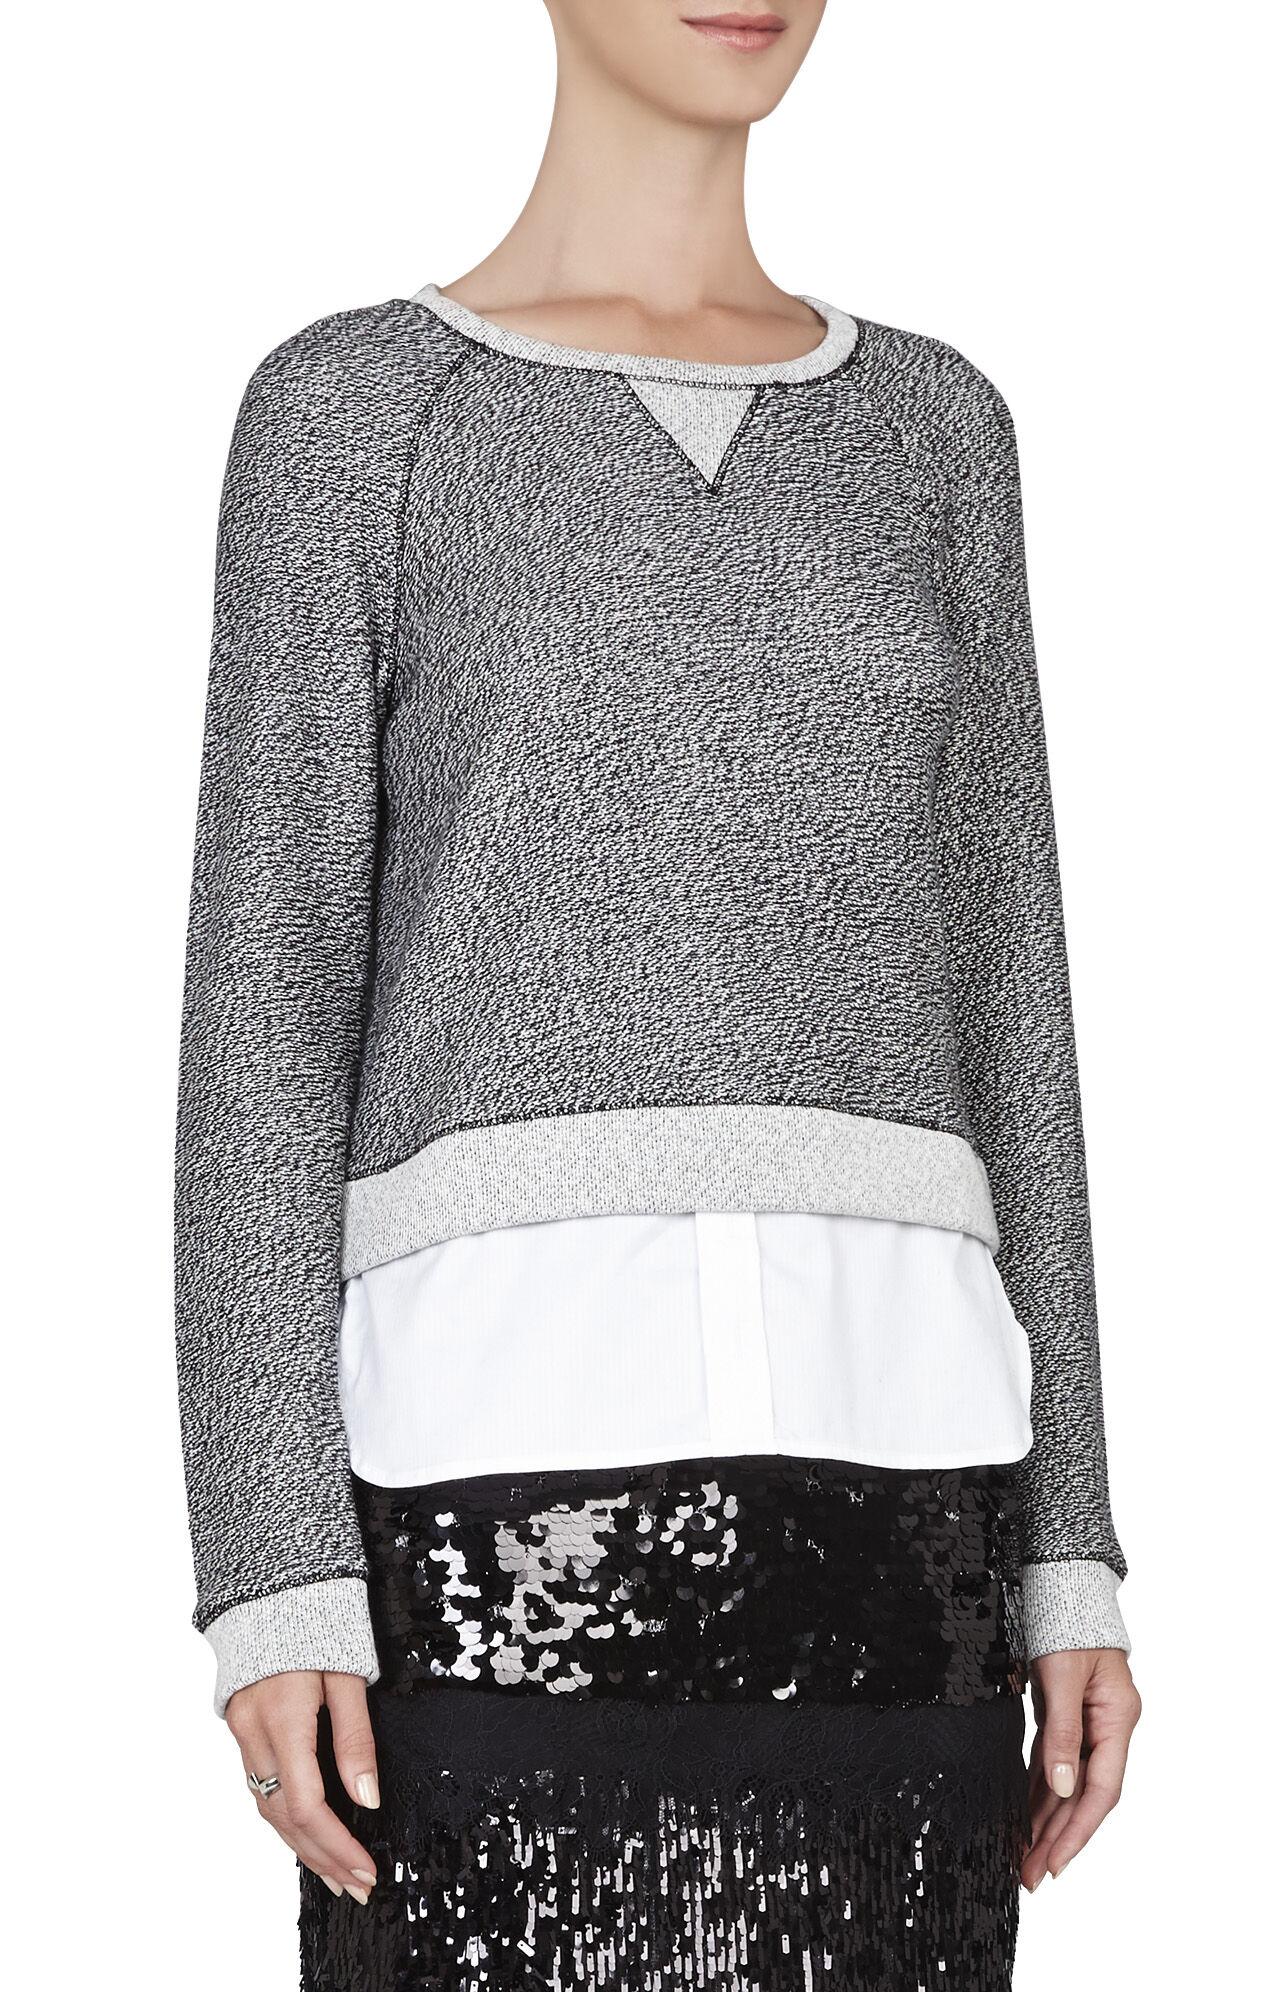 Raven Shirttail Sweatshirt